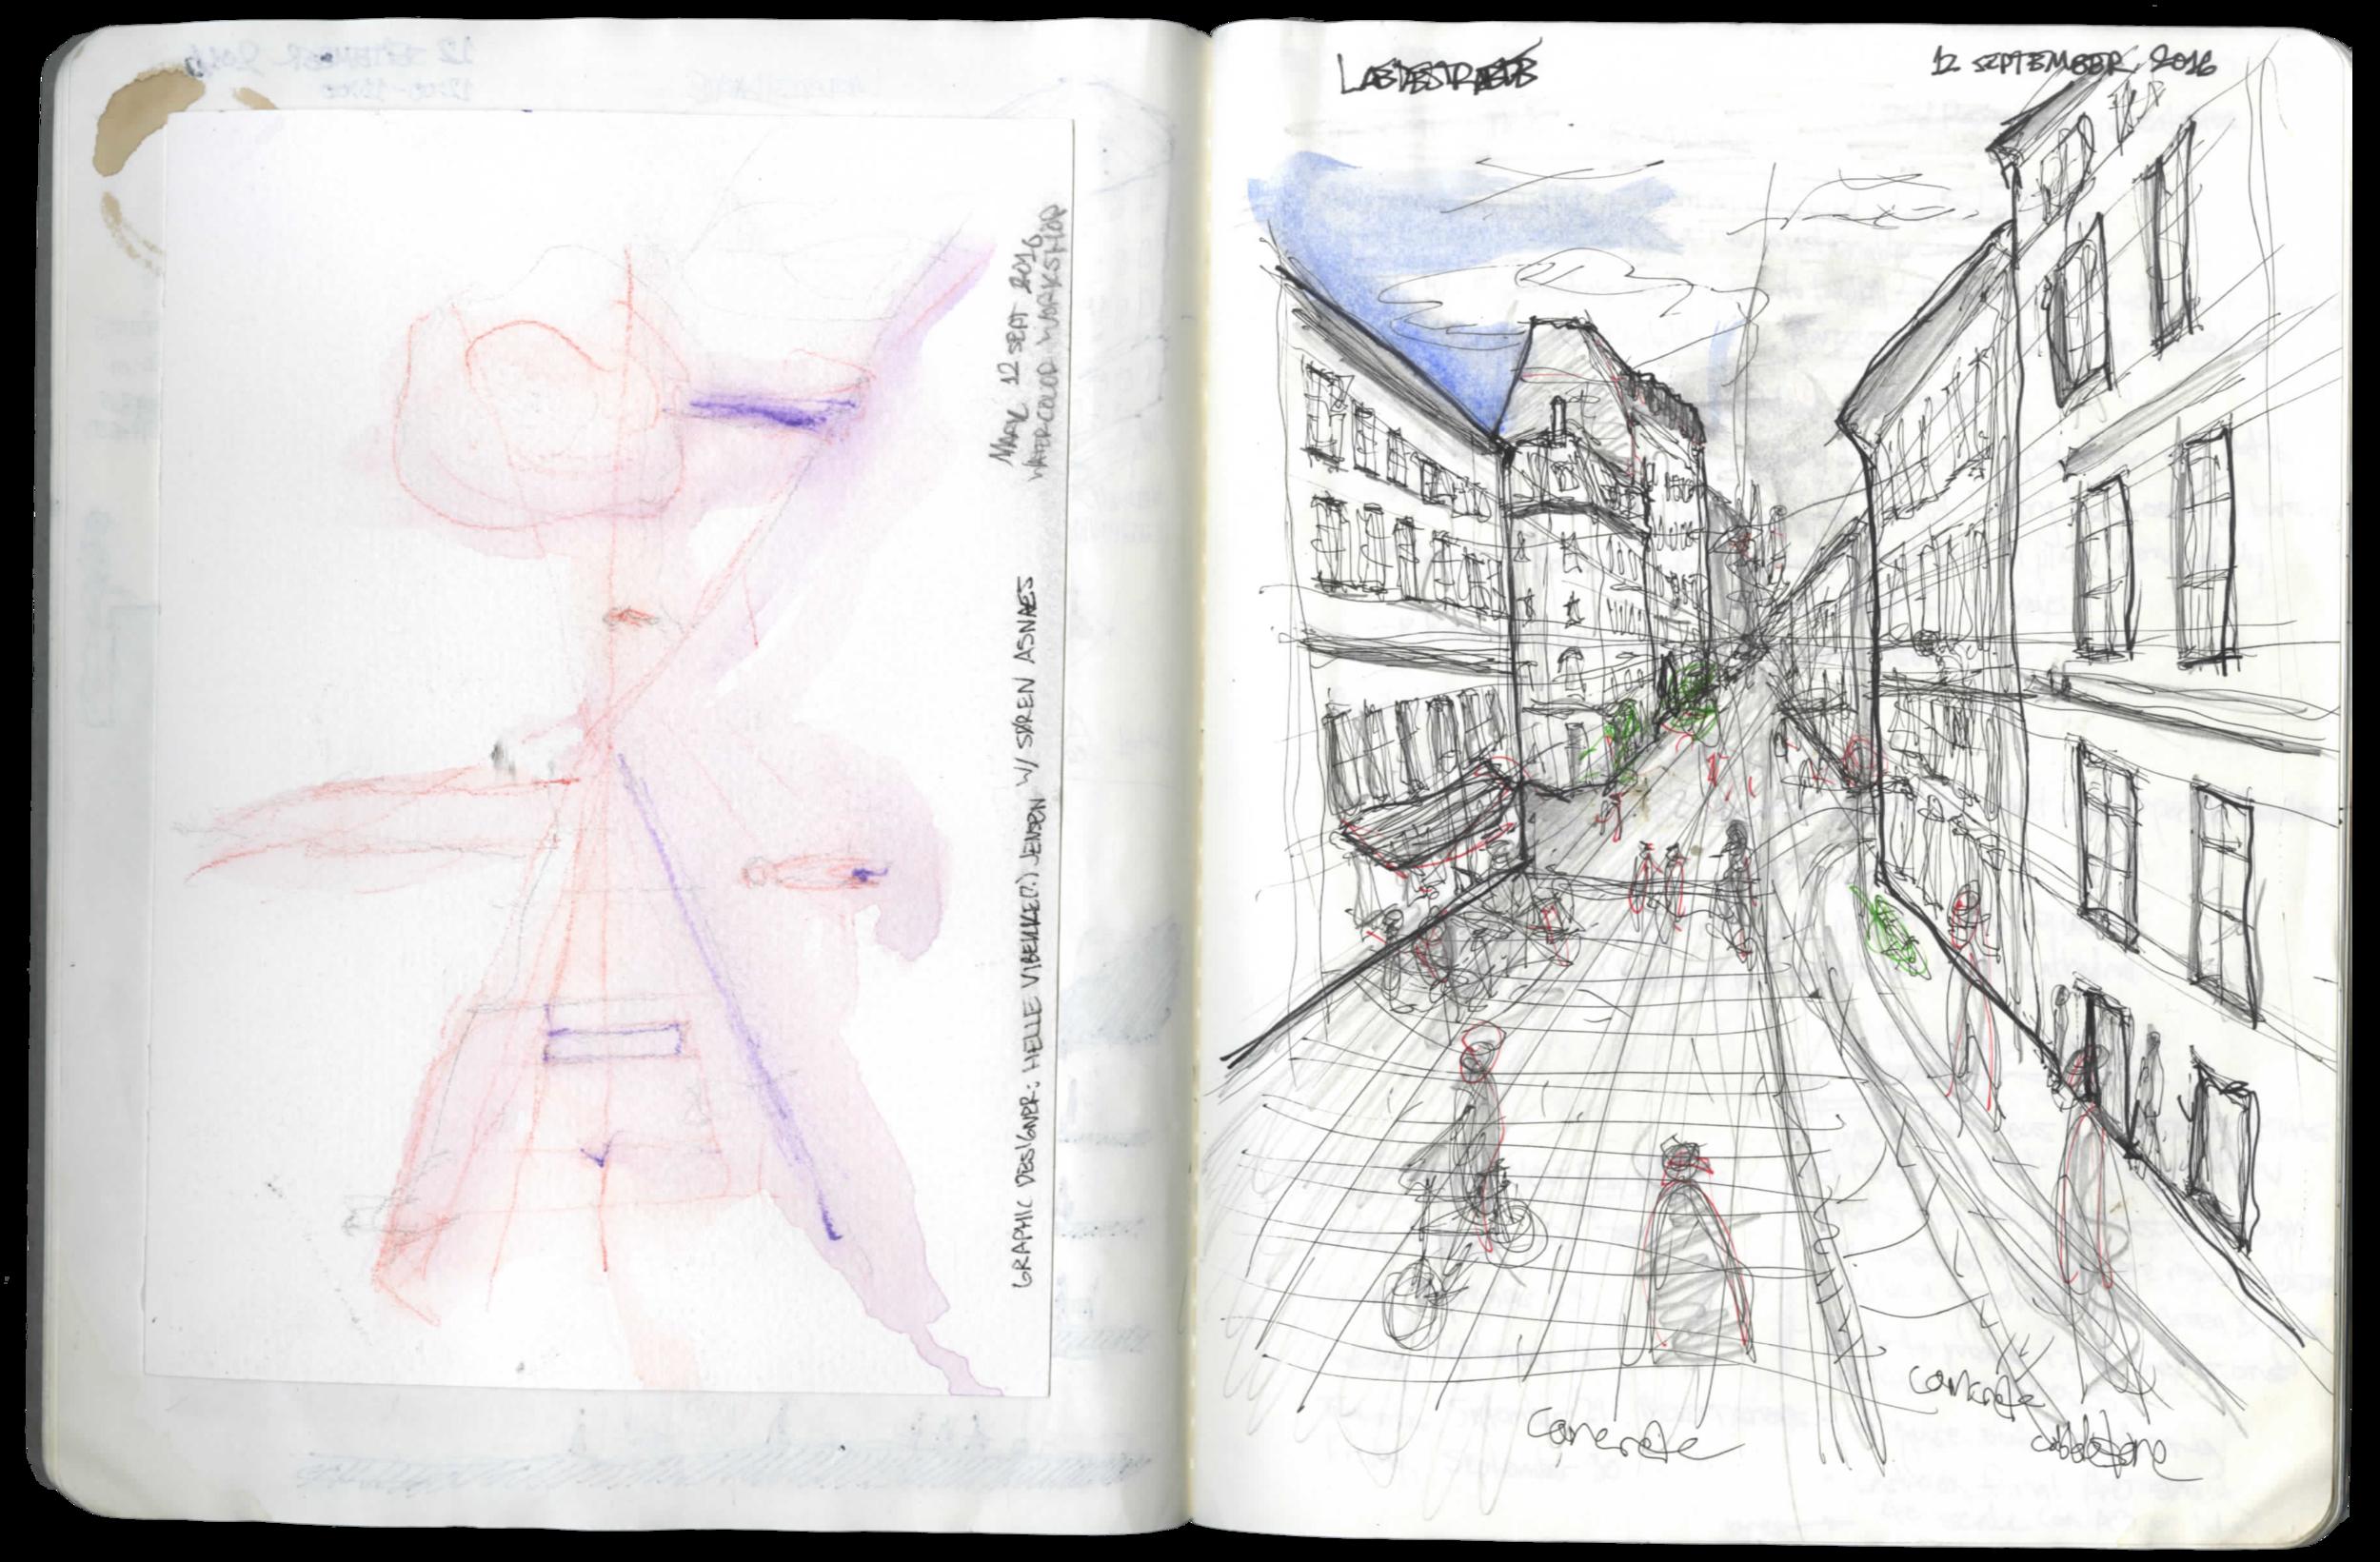 Mark_Terra-Salomão_Scandinavia_Sketchbook-11.png